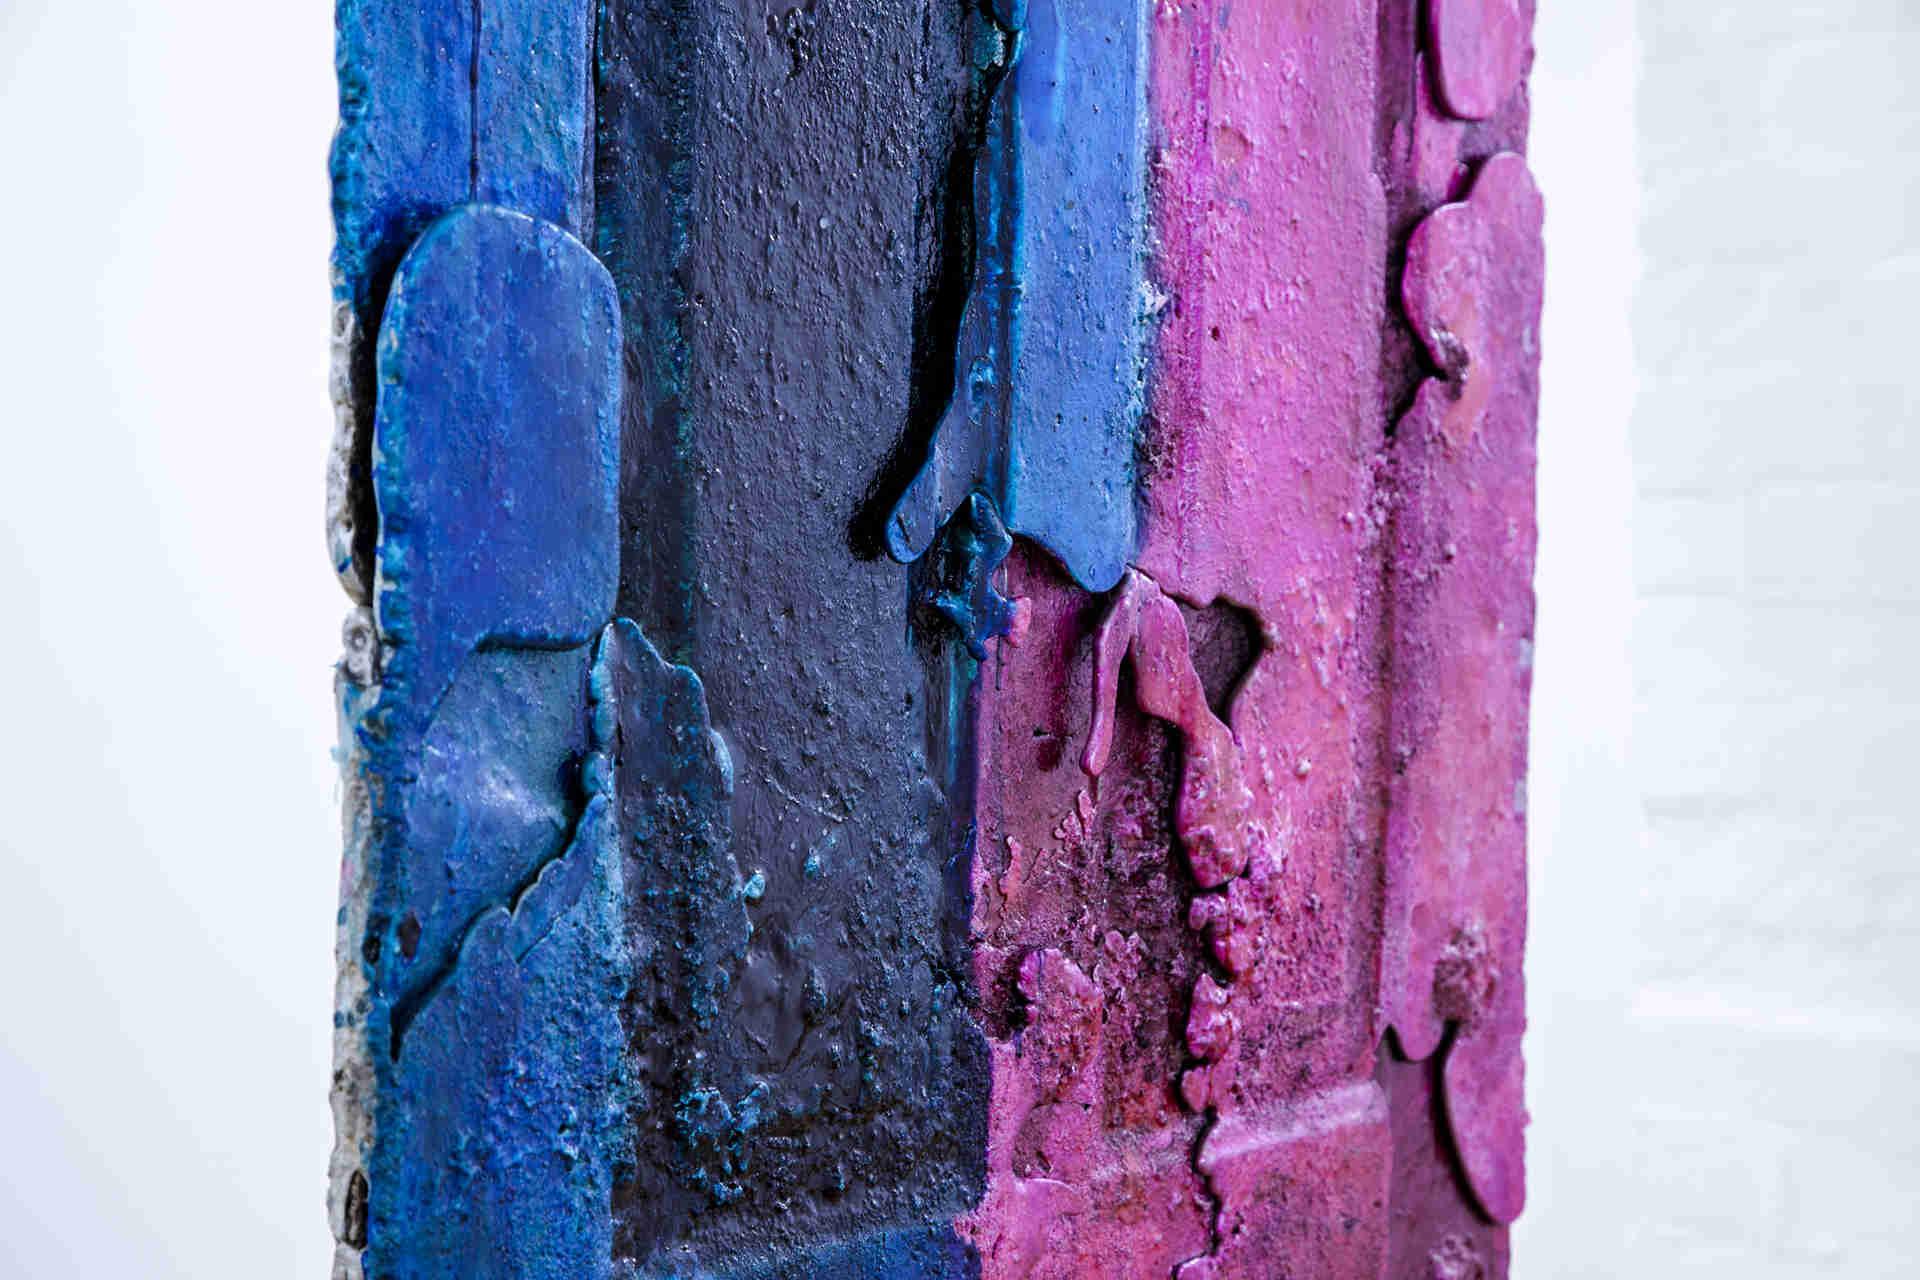 Daniel Terna_321 Gallery_Jake Borndal